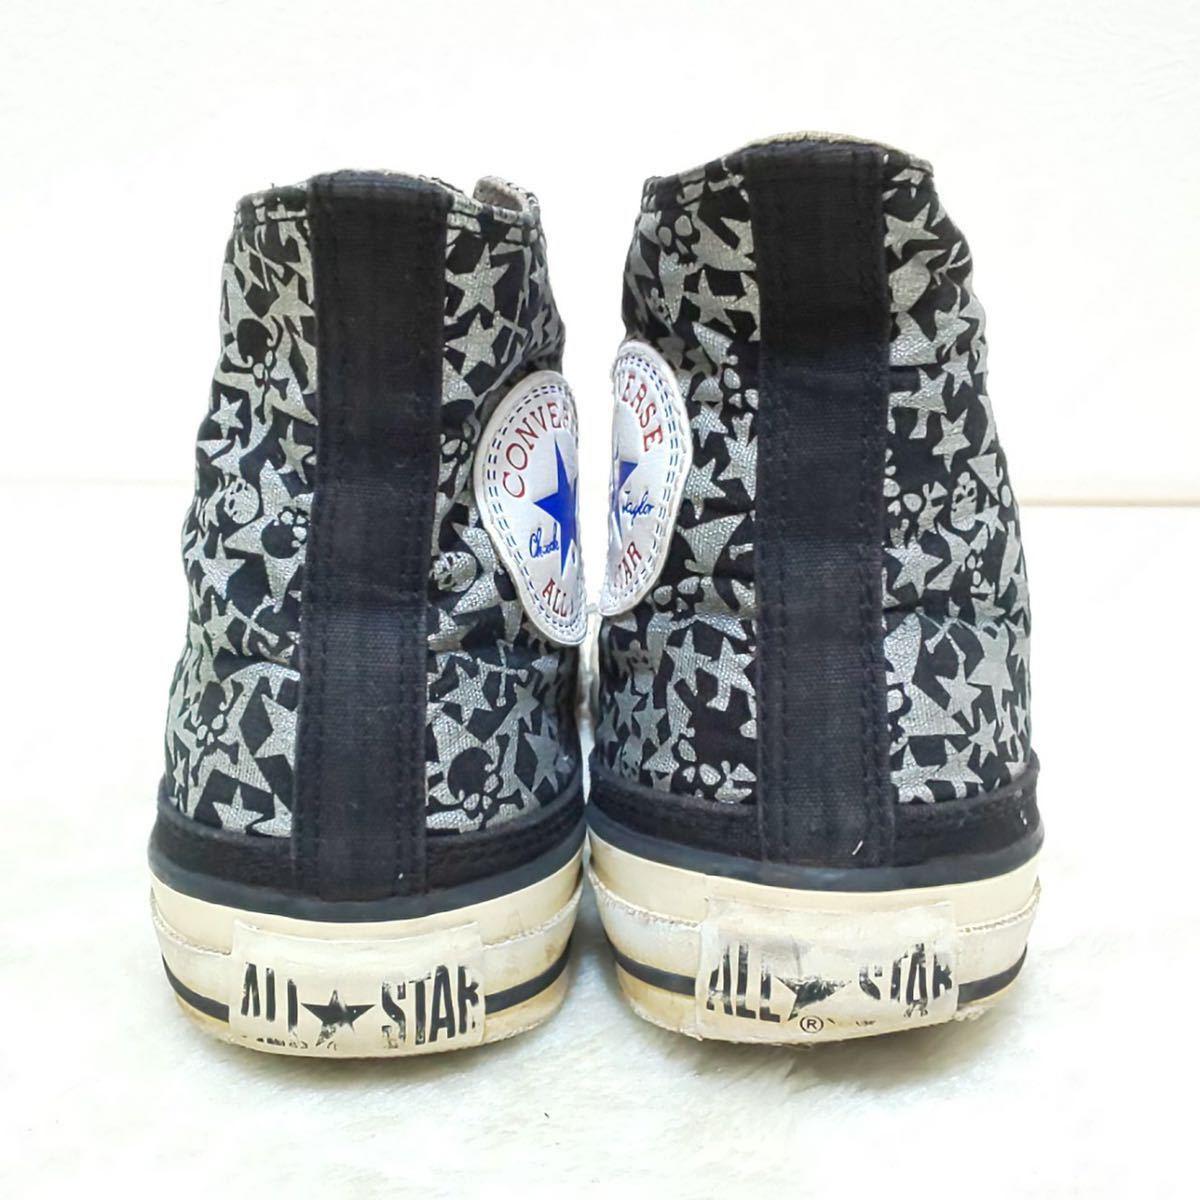 【CONVERSE】コンバースオールスター ALL STAR ハイカットスニーカー キャンバス ドクロ スカル ロック 黒 シルバー 靴 シューズ 24cm/jx_画像4